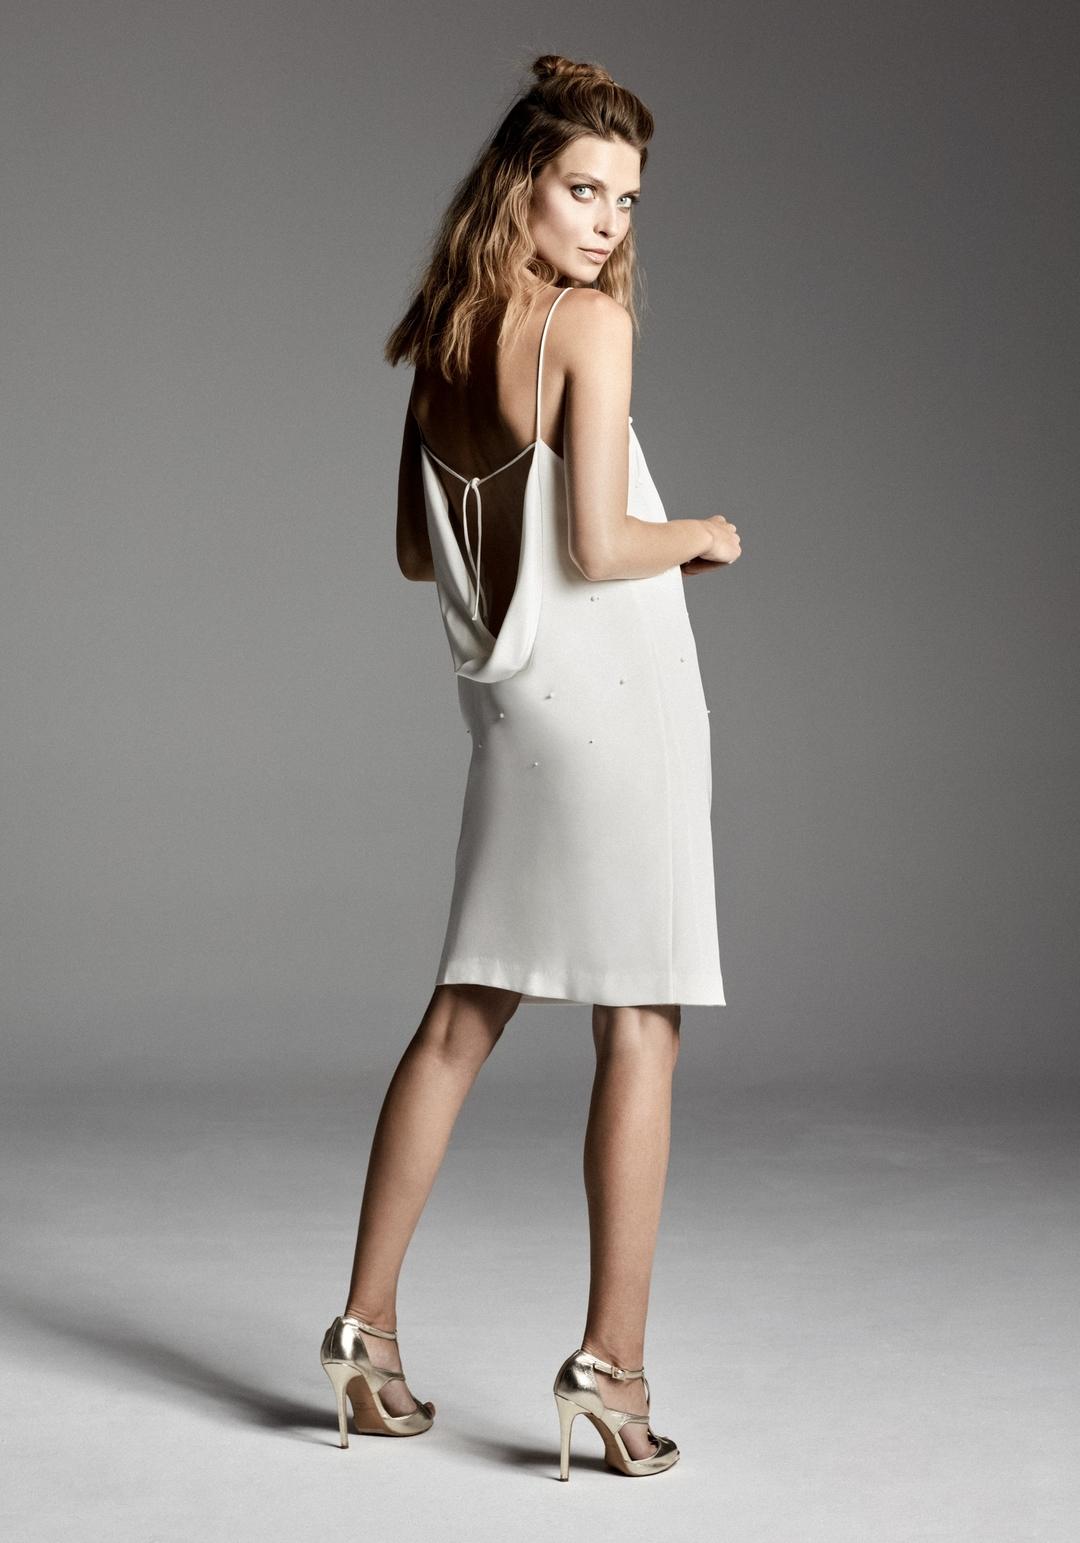 be lovely dress photo